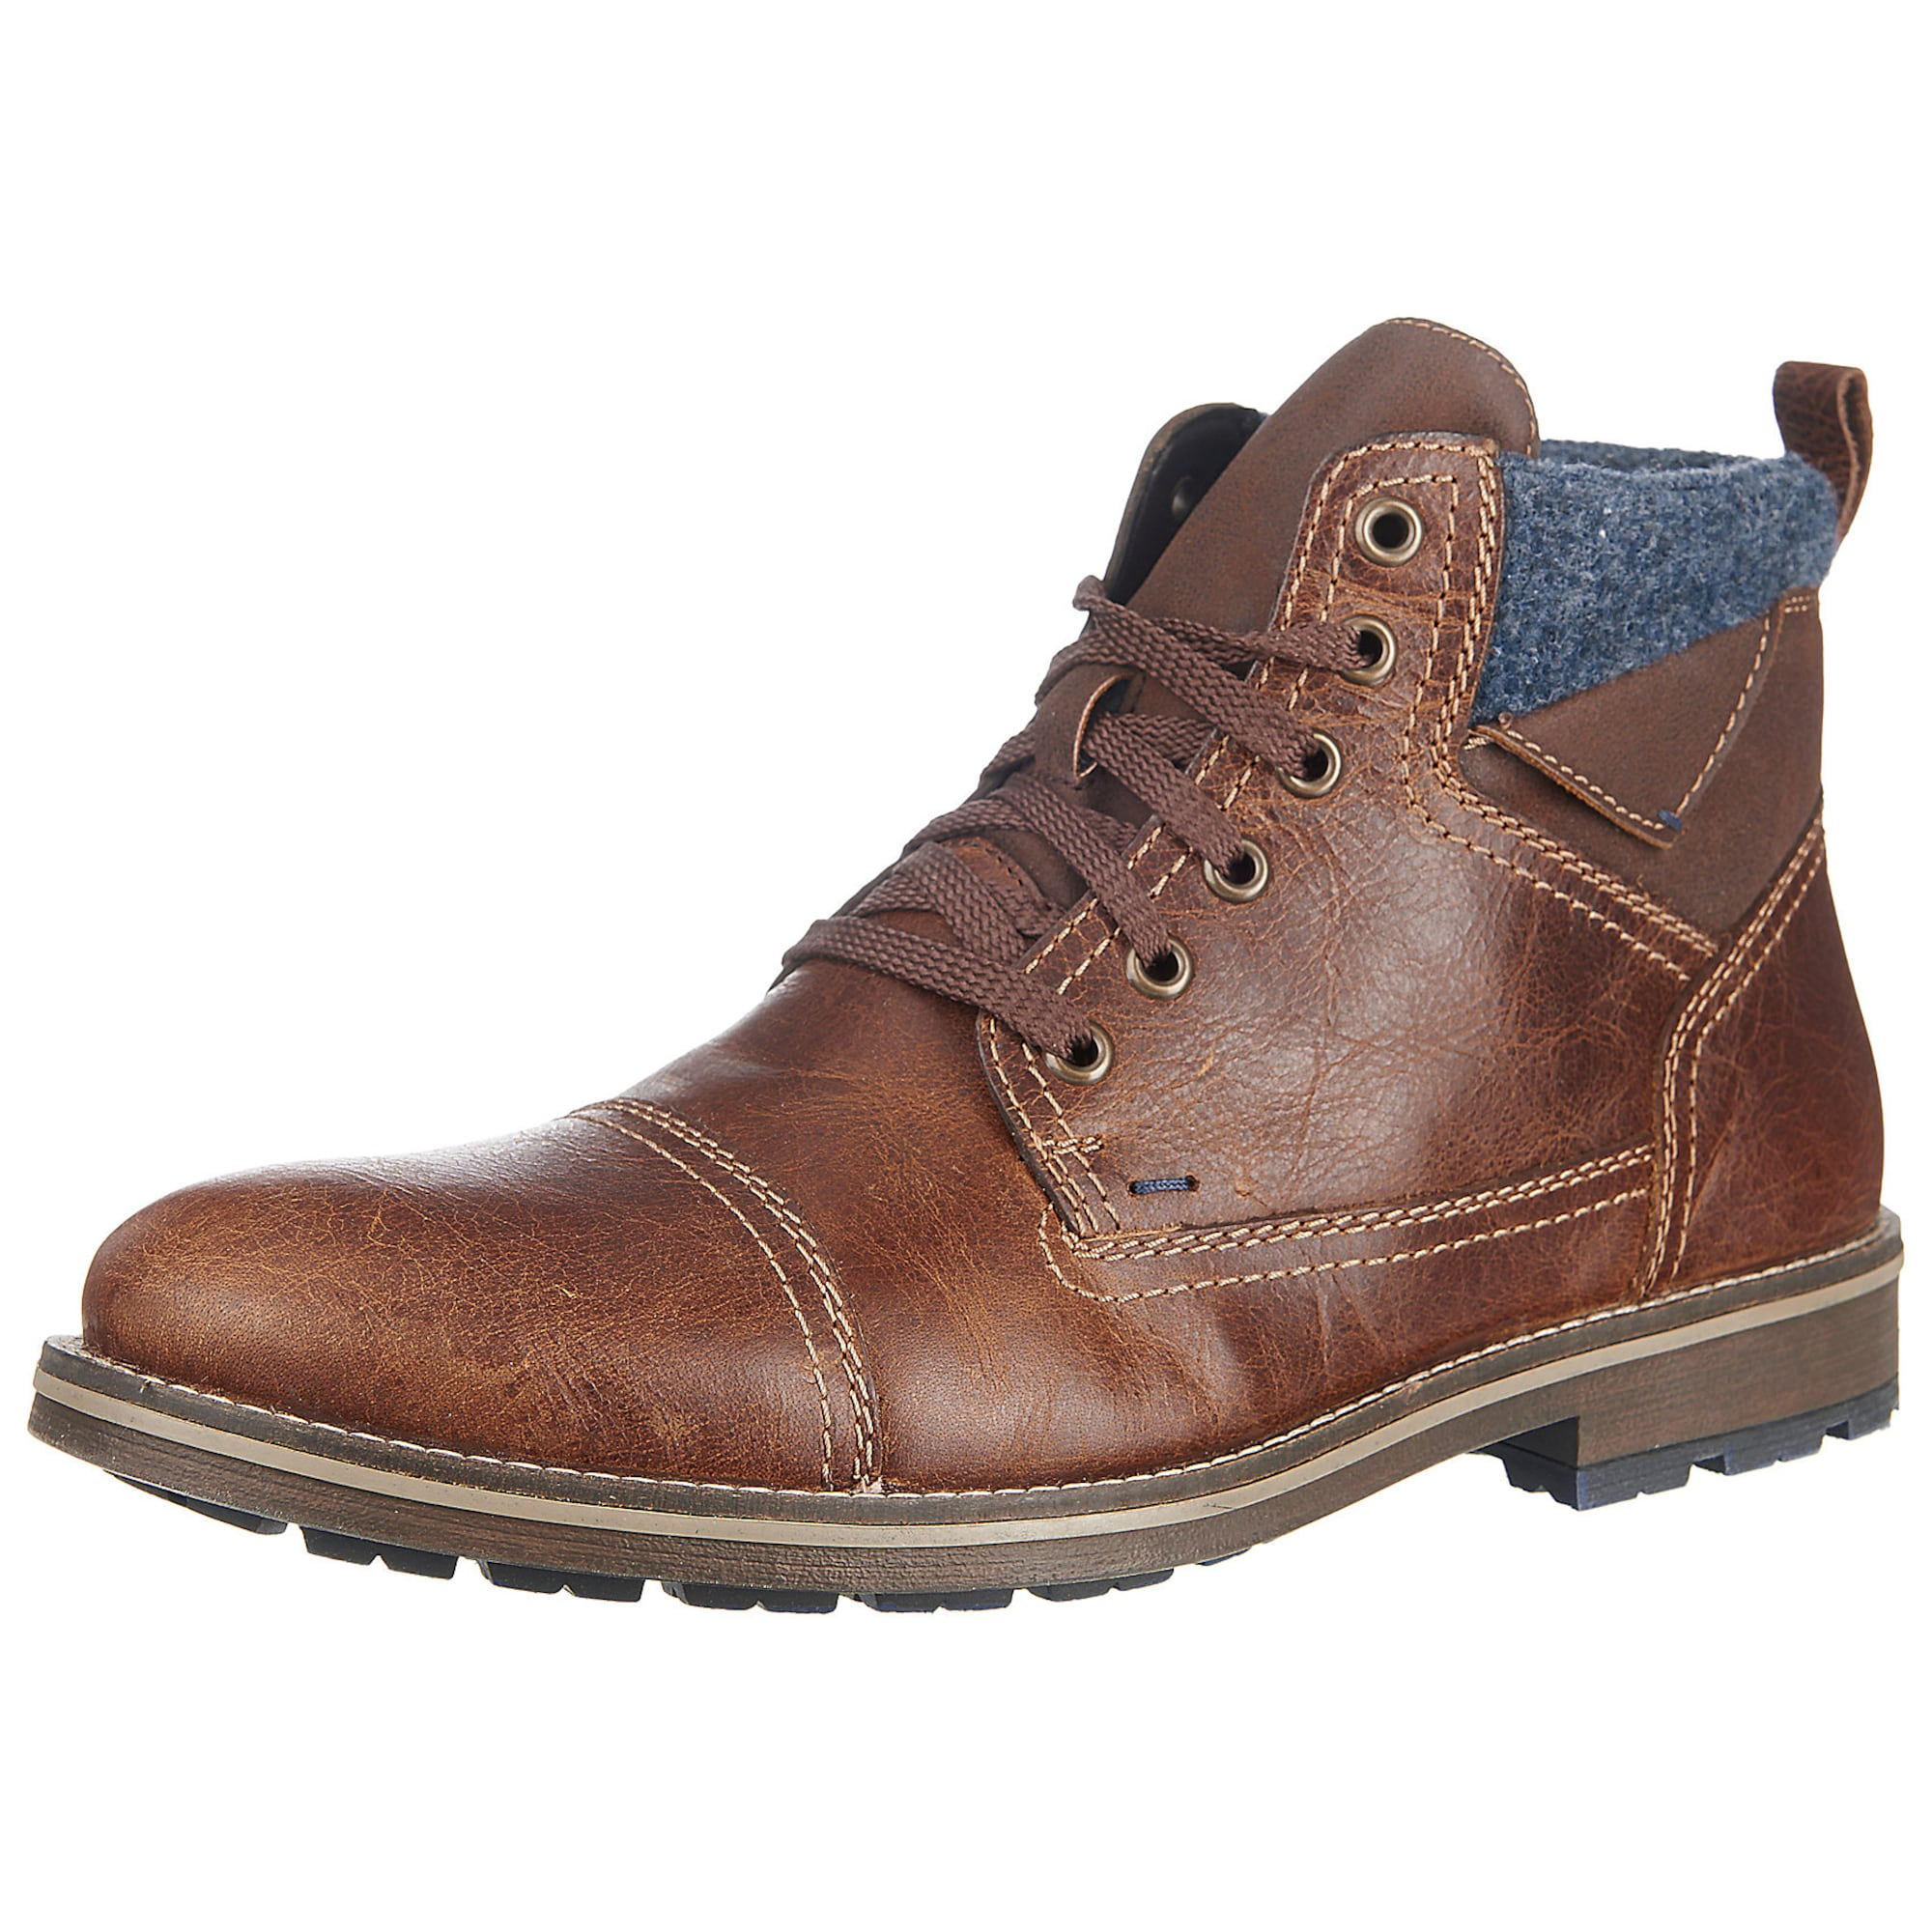 Stiefeletten   Schuhe > Boots   Grau   RIEKER